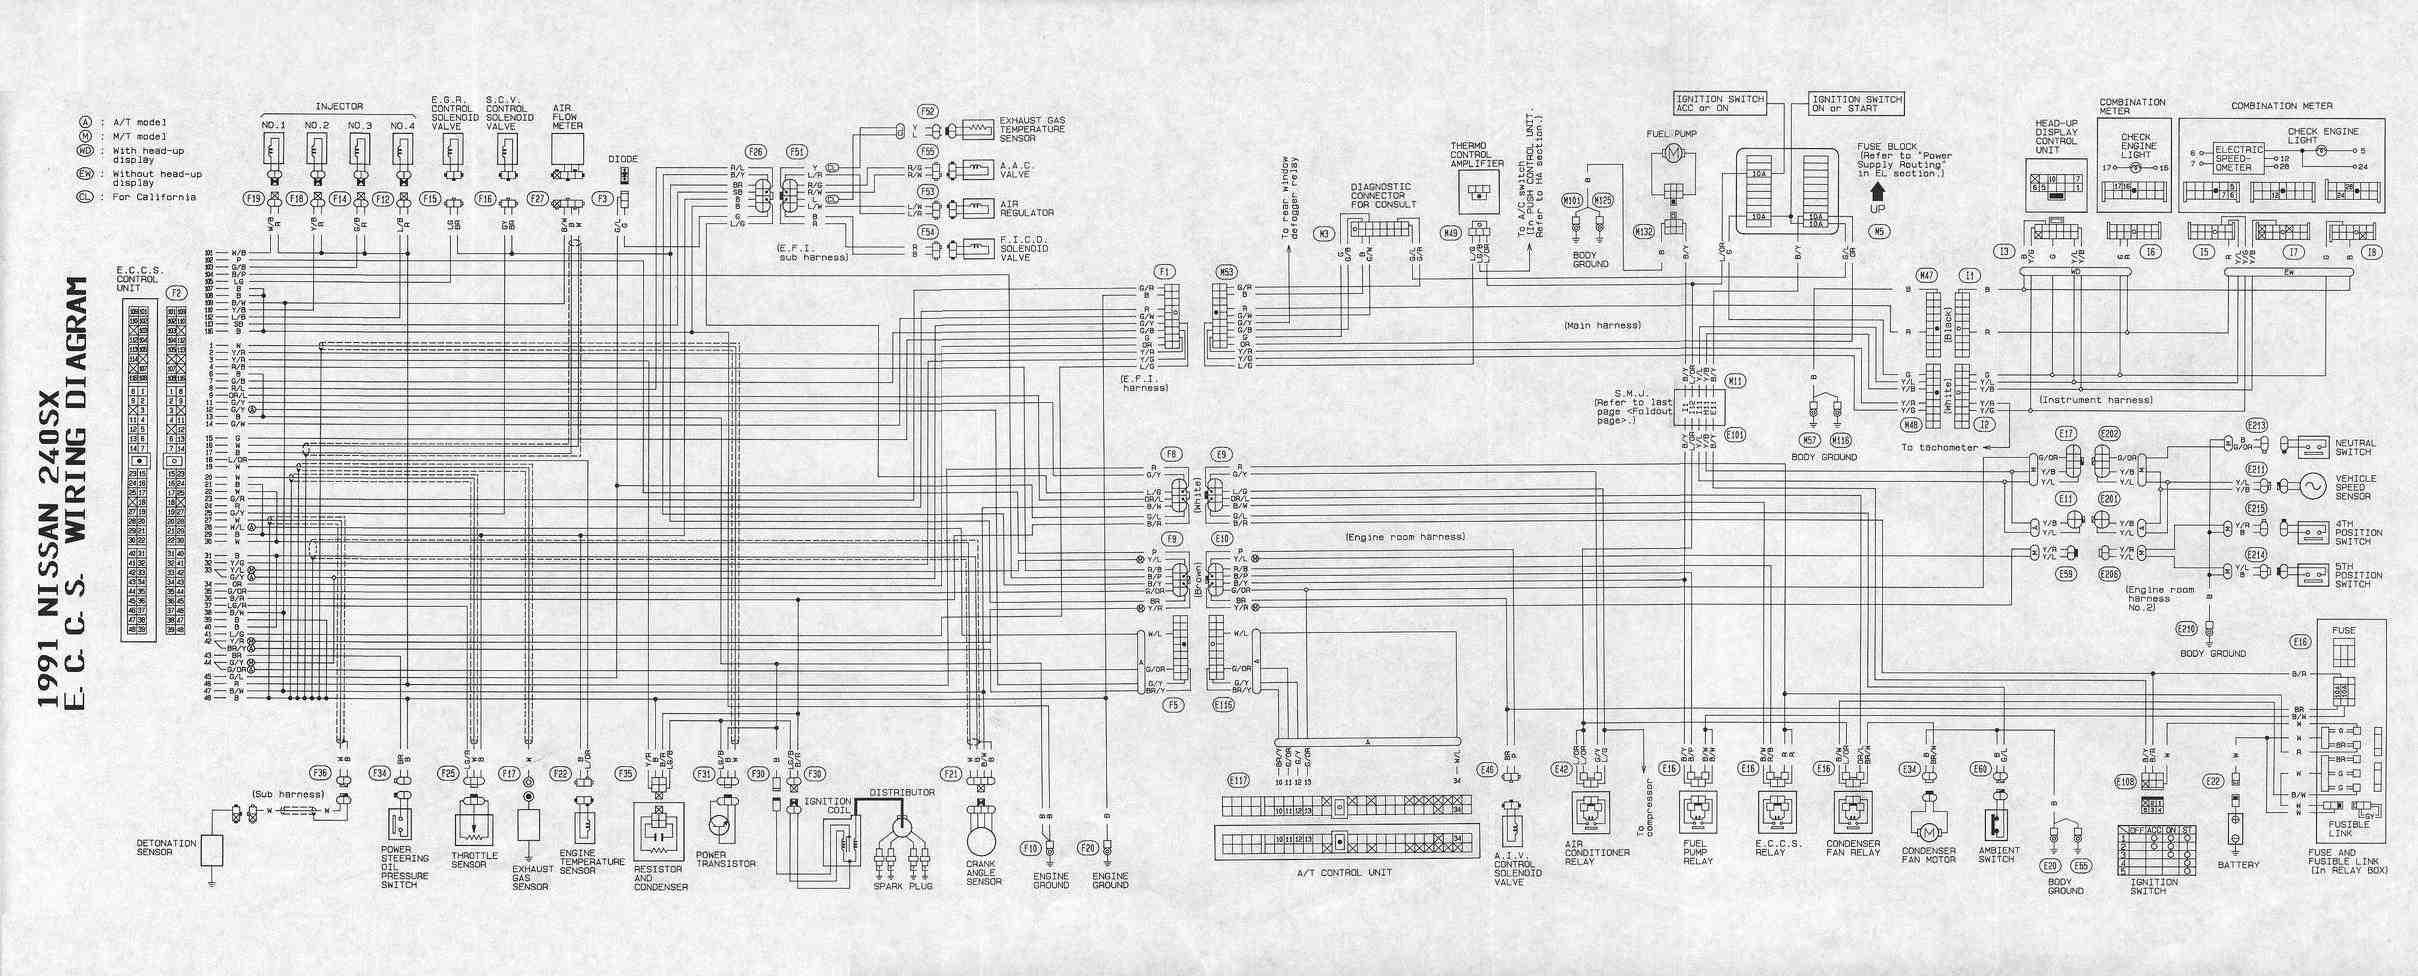 91 Nissan 240sx Wiring Diagrams Free Download Diagram - Wiring ... on 91 oldsmobile 88 royale, 91 oldsmobile calais, 91 oldsmobile century, 91 oldsmobile bravada, 91 oldsmobile ninety eight, 91 oldsmobile trofeo, 91 oldsmobile silhouette, olds toronado, 91 oldsmobile 98 regency, 91 oldsmobile delta 88, 91 oldsmobile ciera,